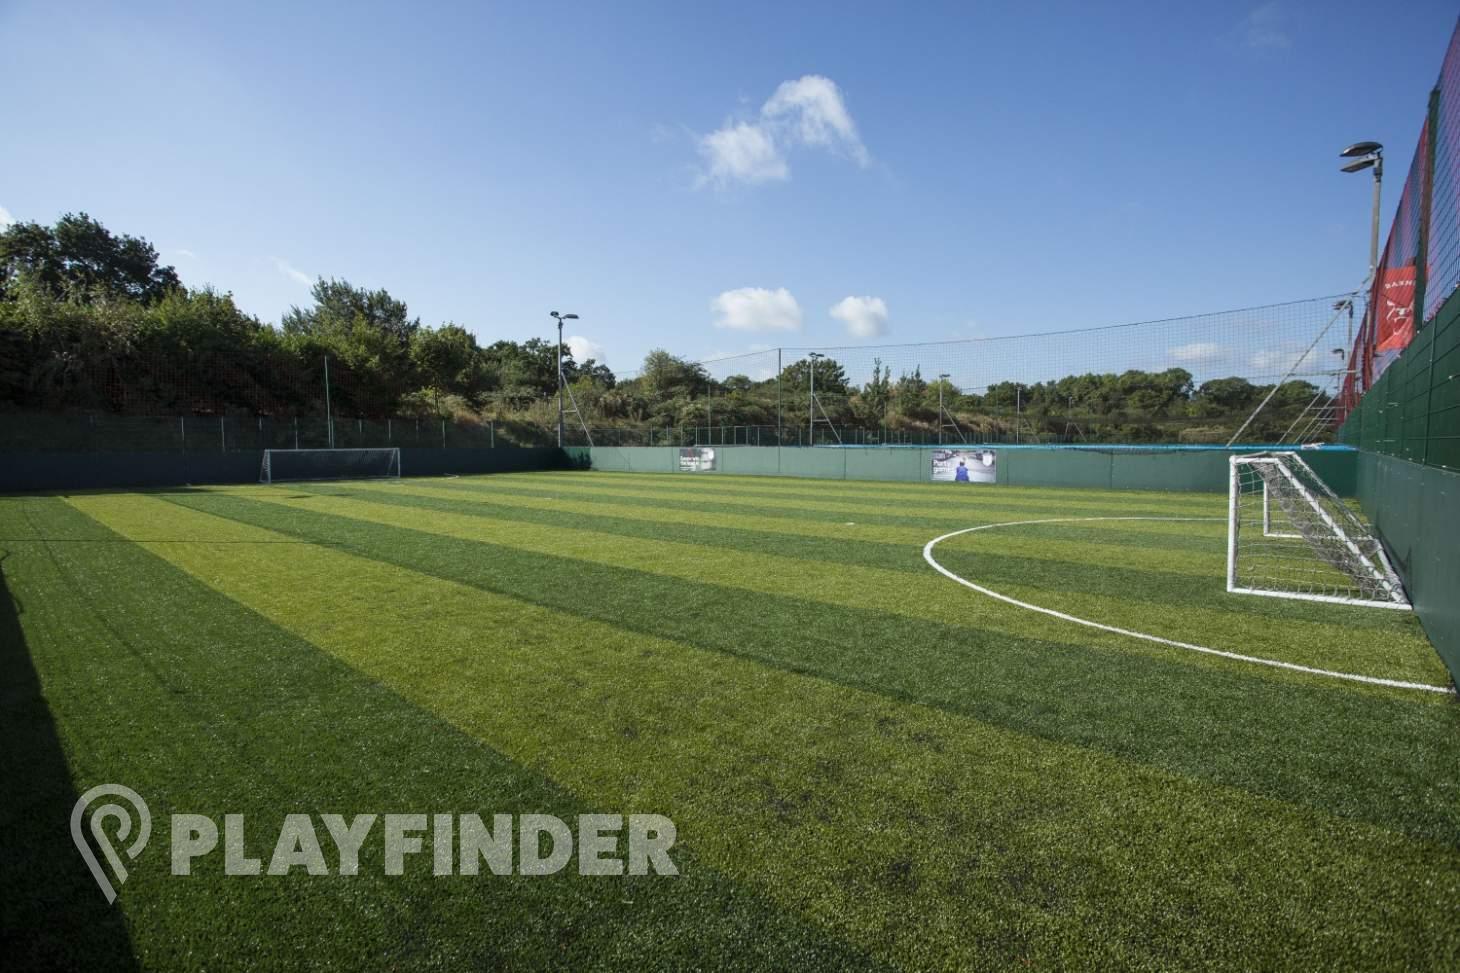 Powerleague Sighthill 5 a side | 3G Astroturf football pitch